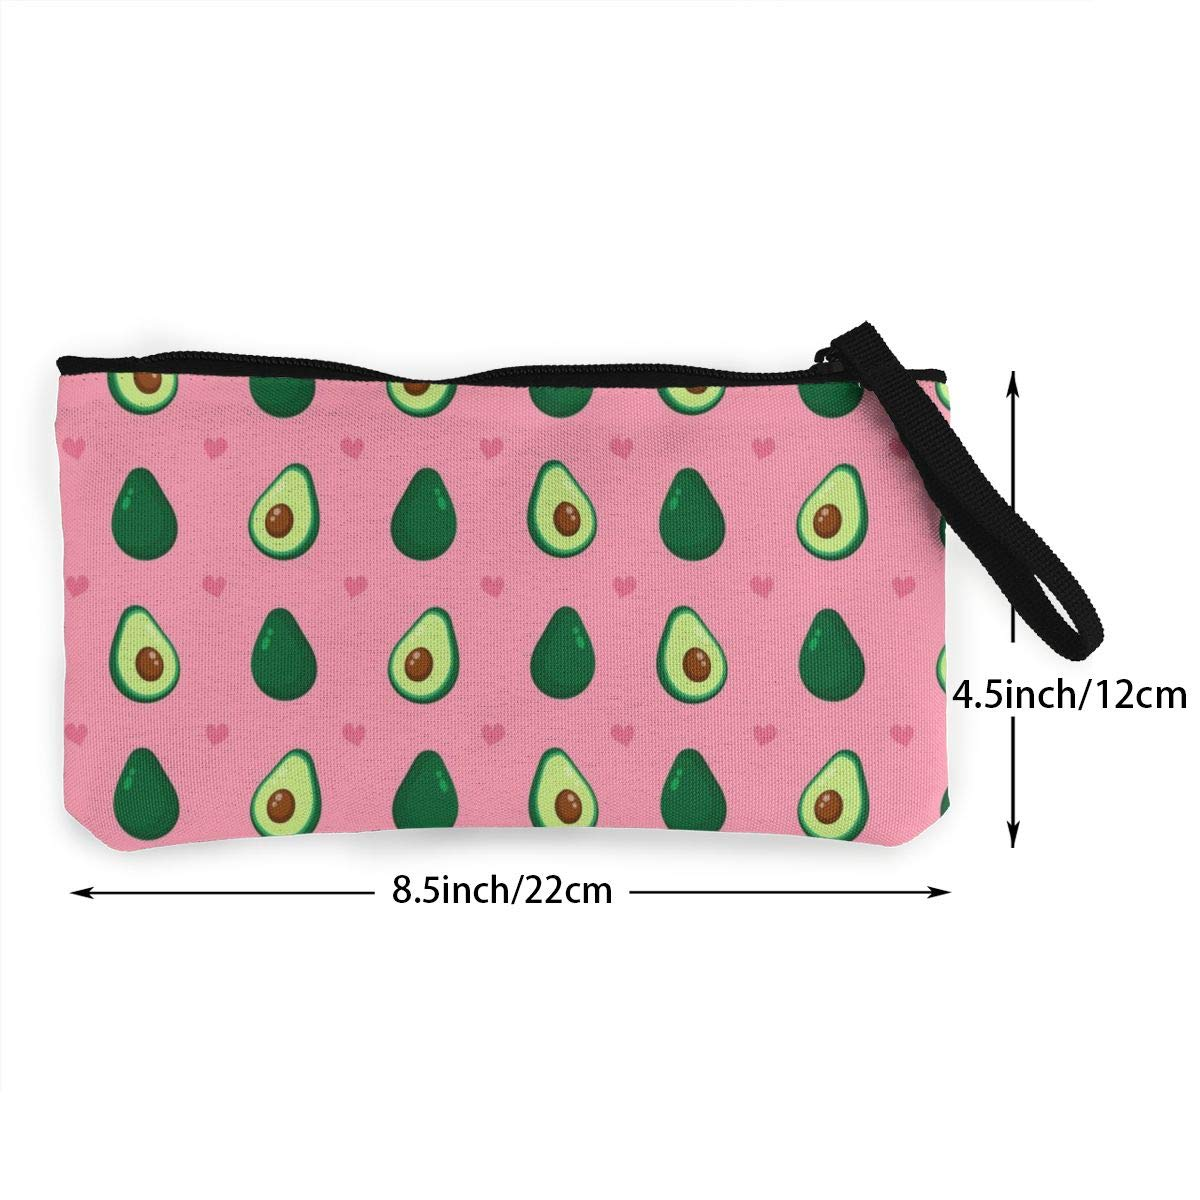 Canvas Coin Purse Cute Beauty Avocado And Hearts Zipper Wallet Bag Change Purse Pouch Key Purse Pouch